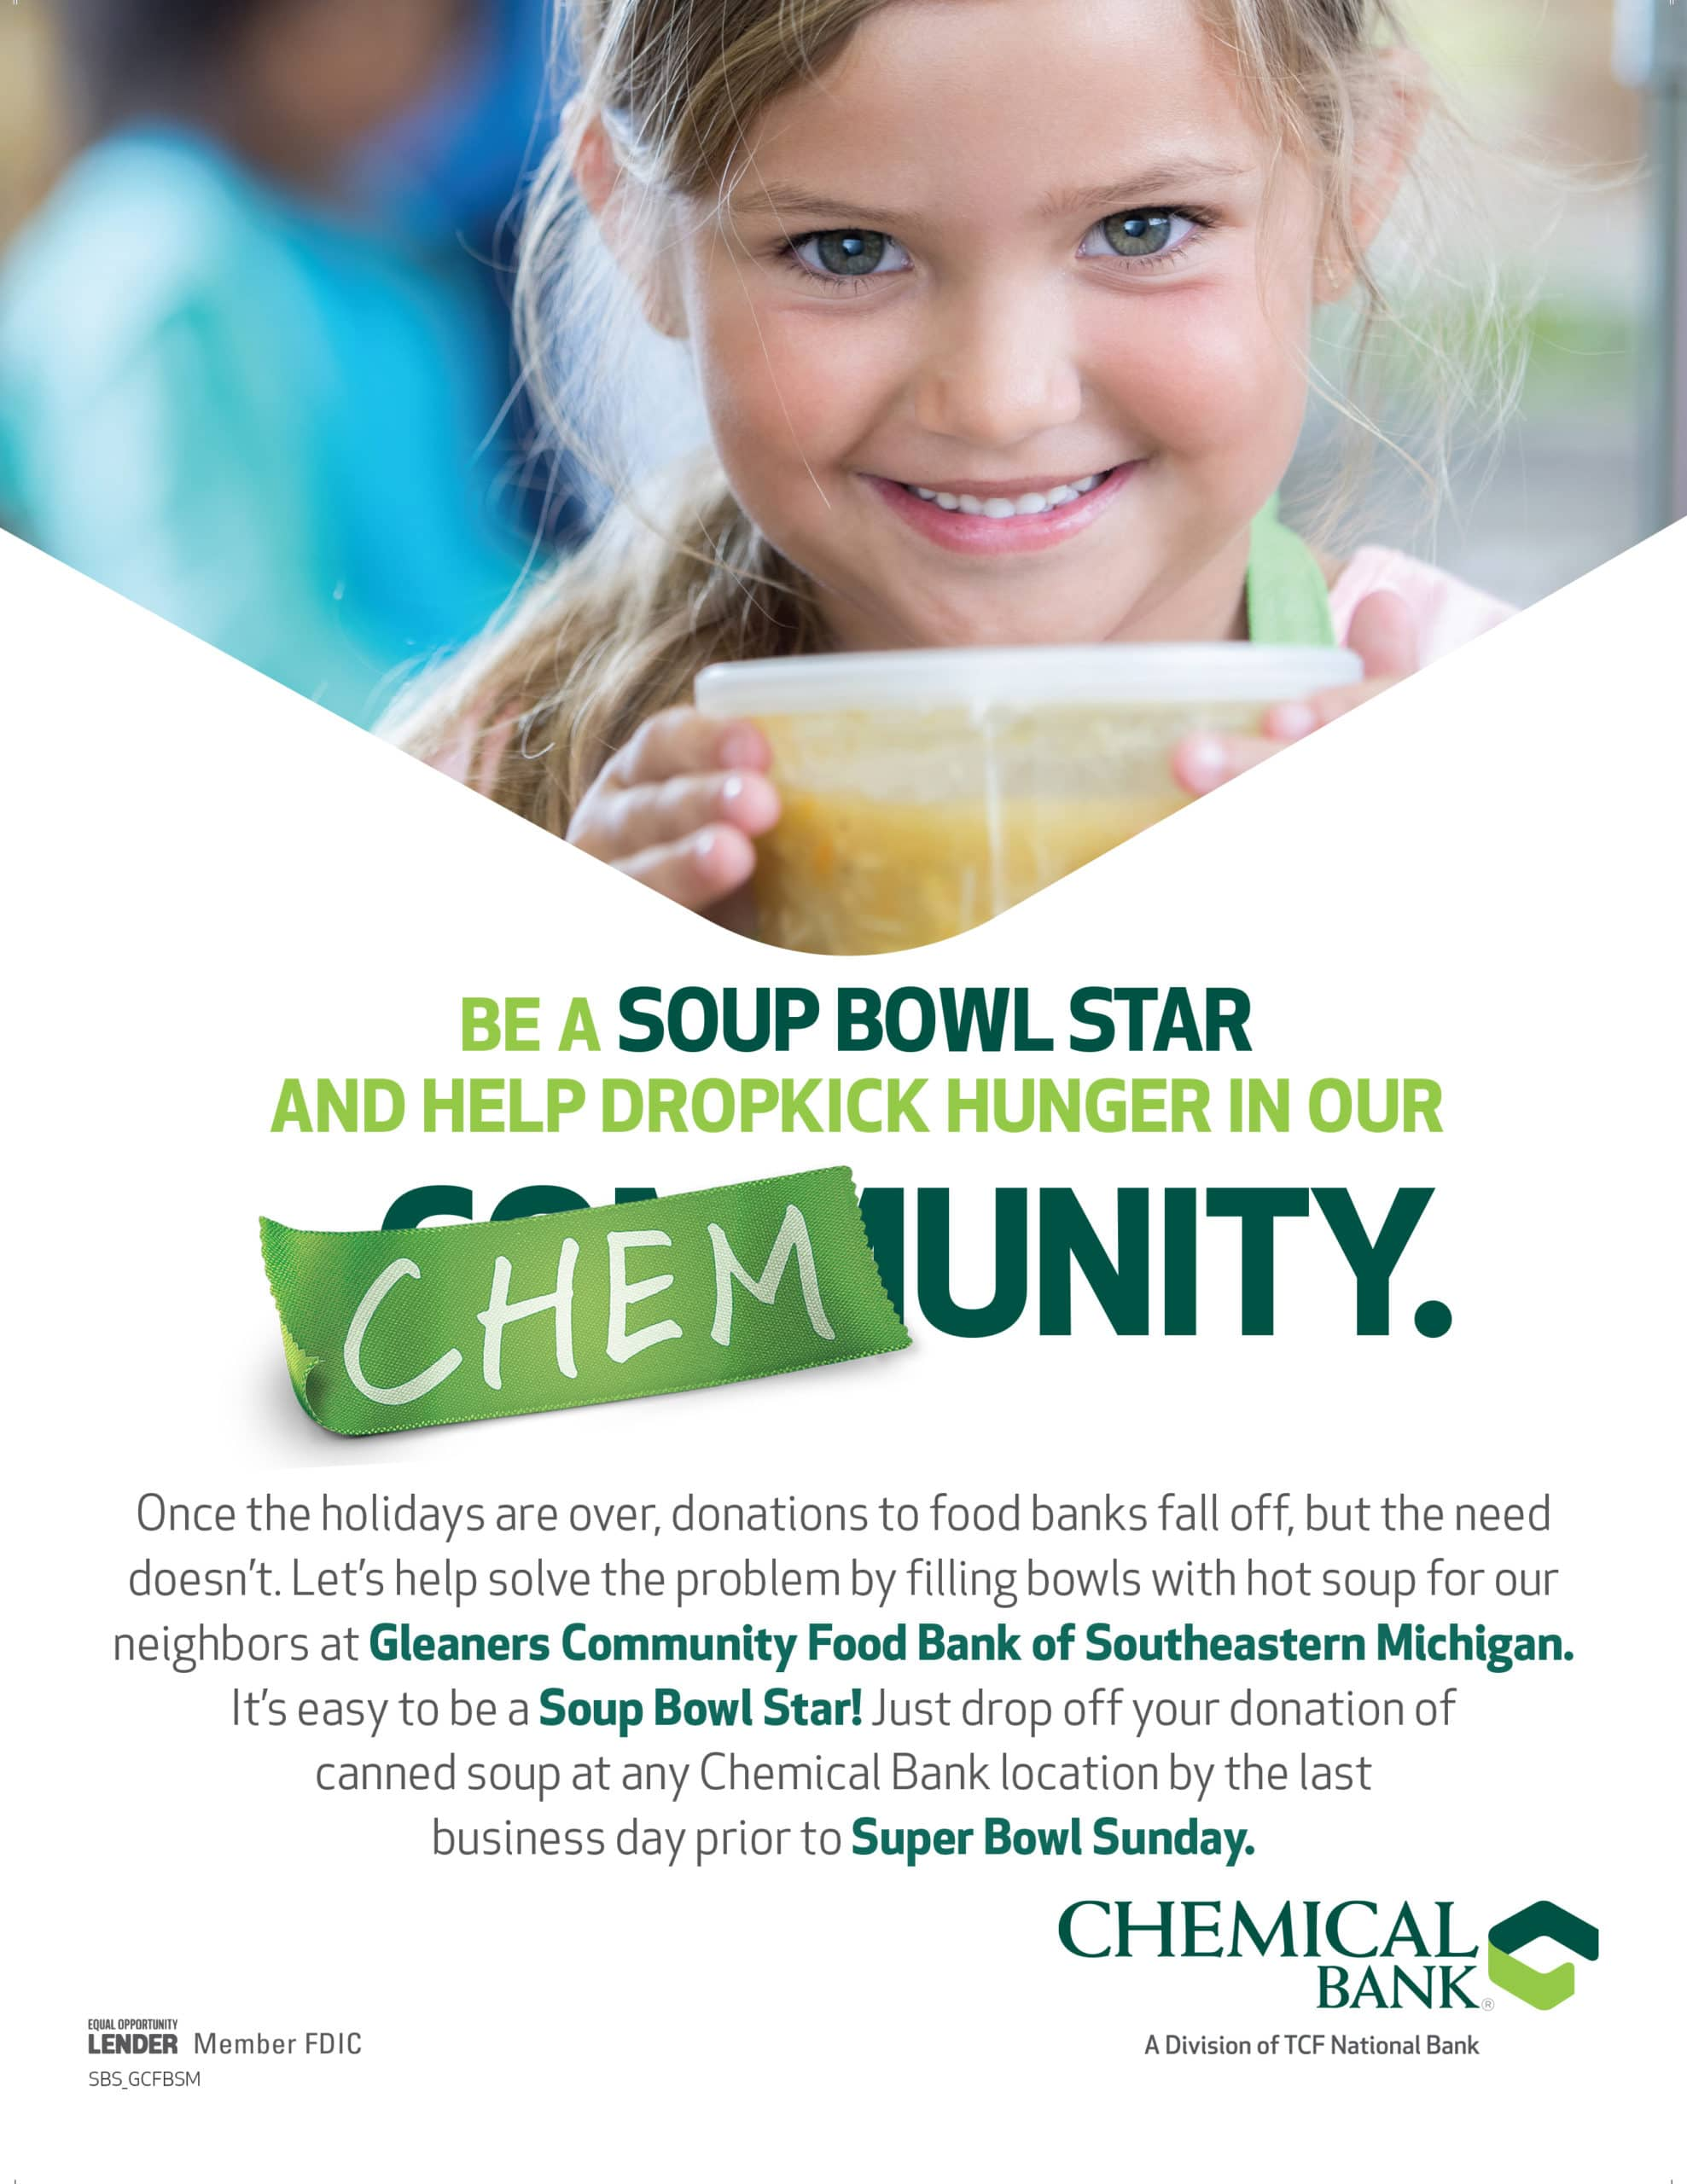 Chemical Bank: Soup Bowl